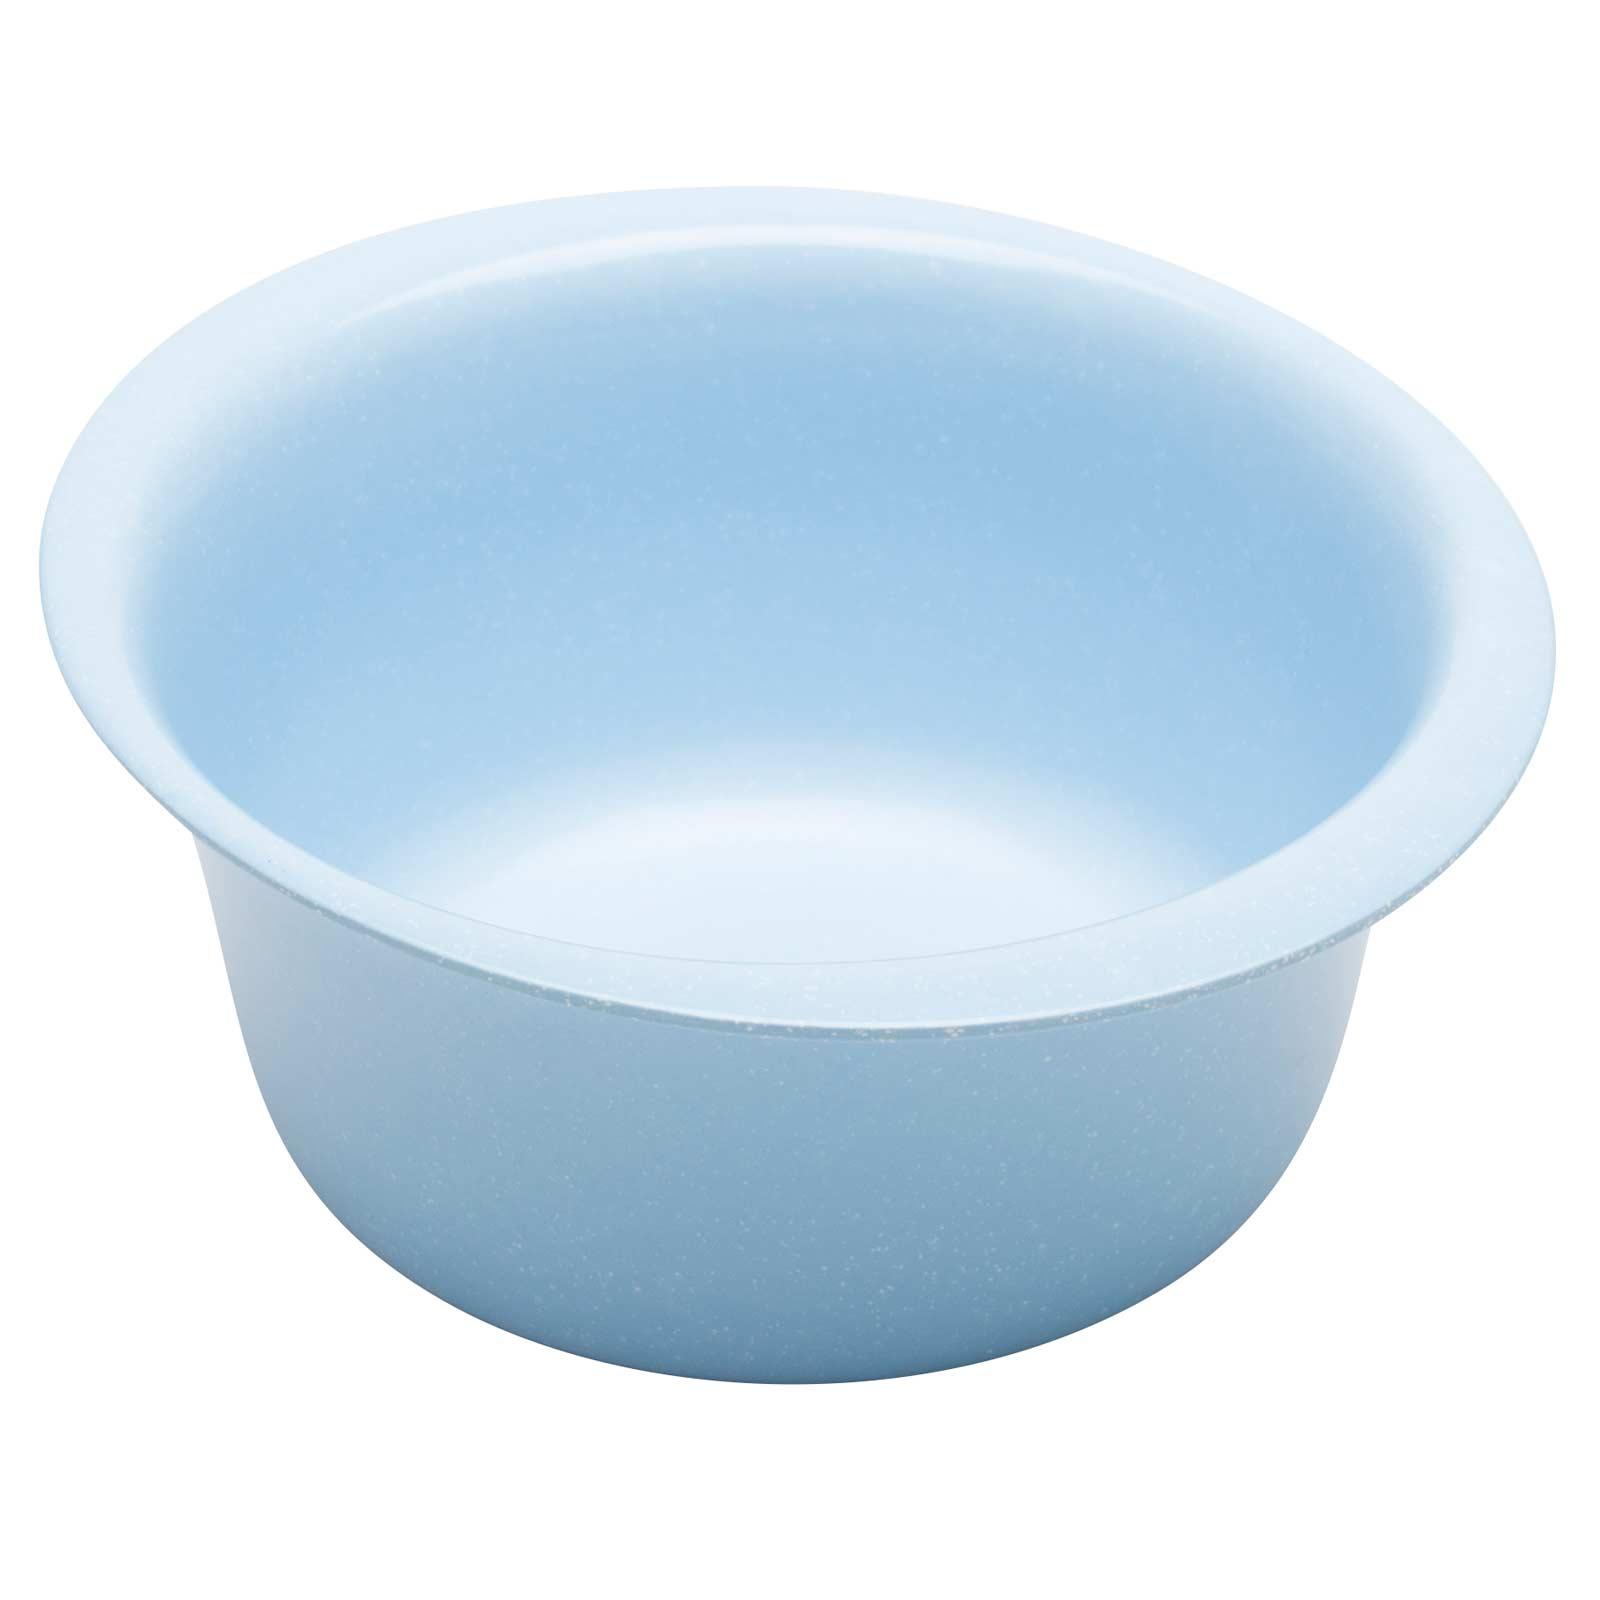 Microwave Safe Pan By Zak Designs